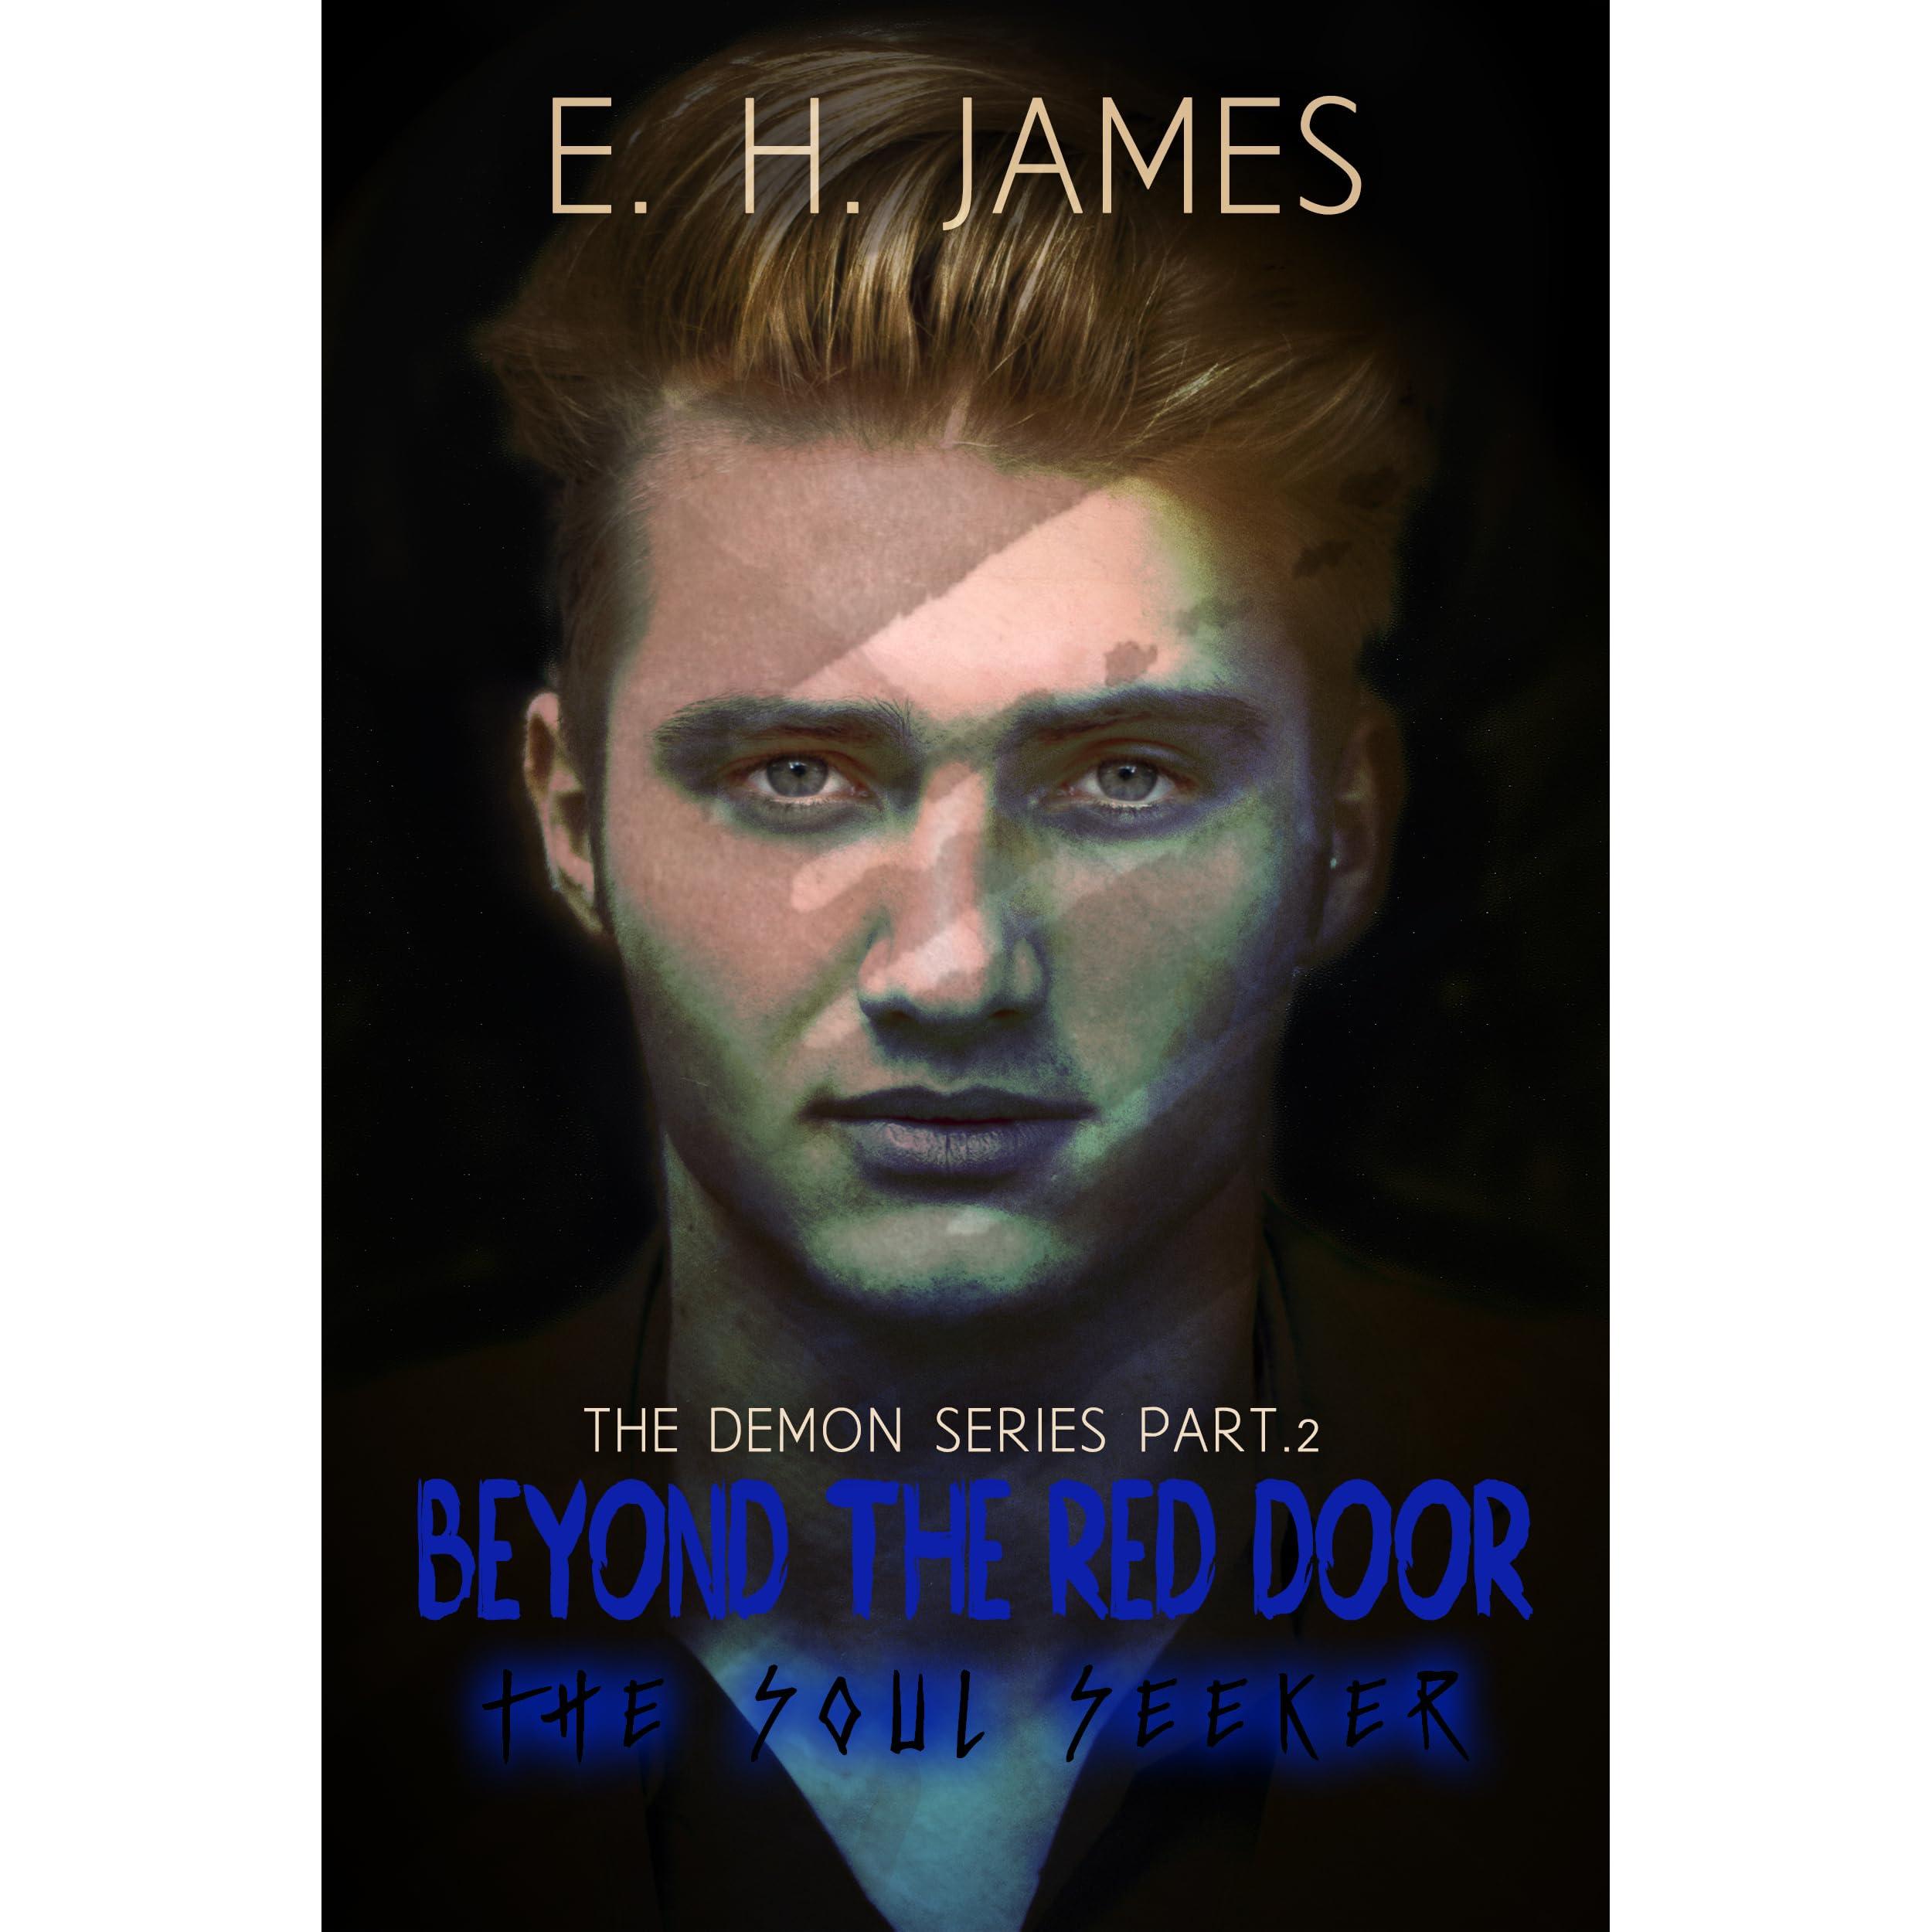 Beyond The Red Door The Soul Seeker By Eh James